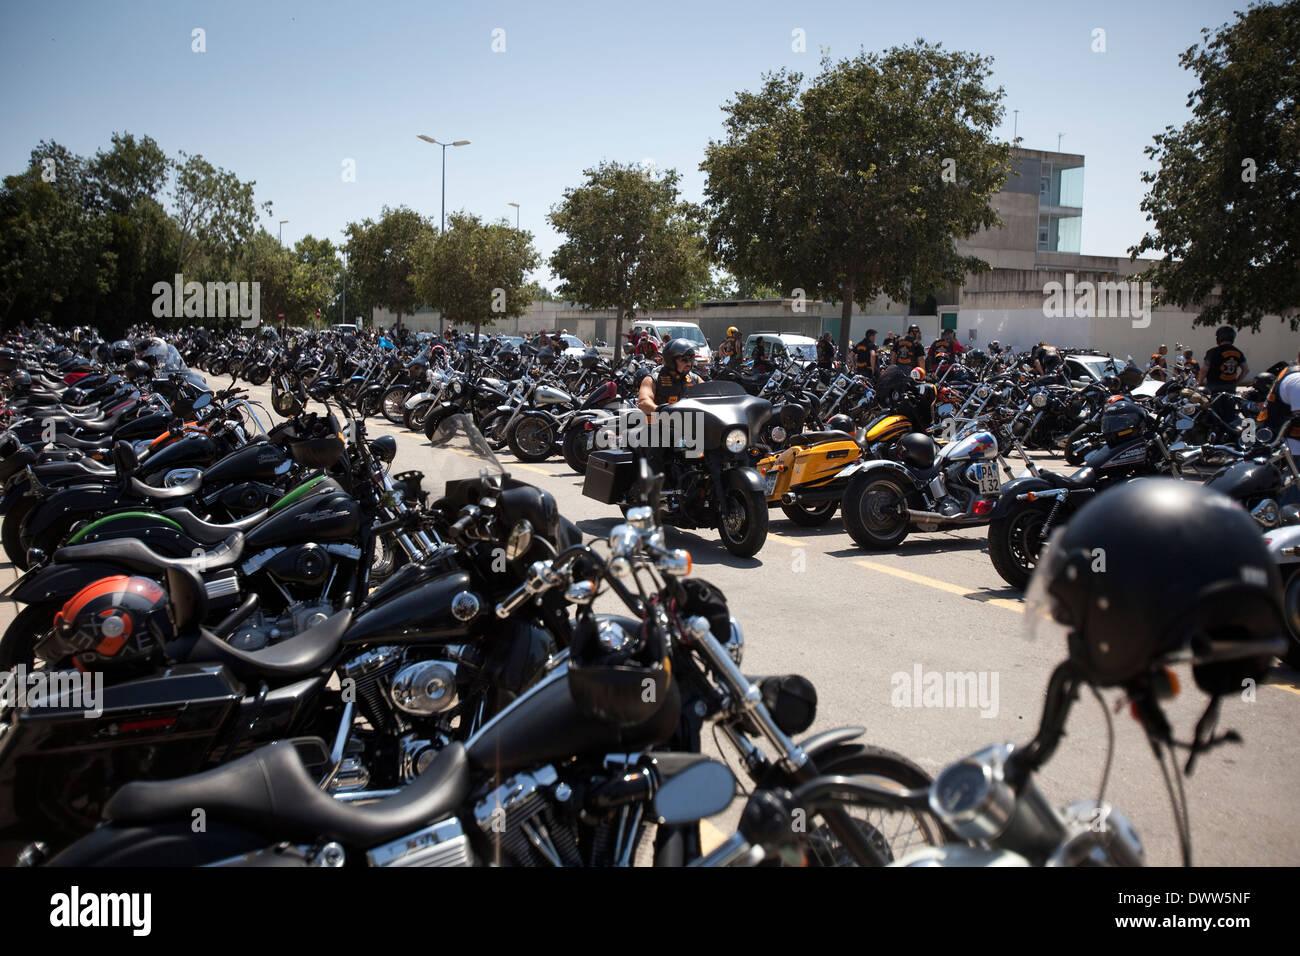 Biker Moto Motocicleta Motorbike Park Parked Transport Vehicle